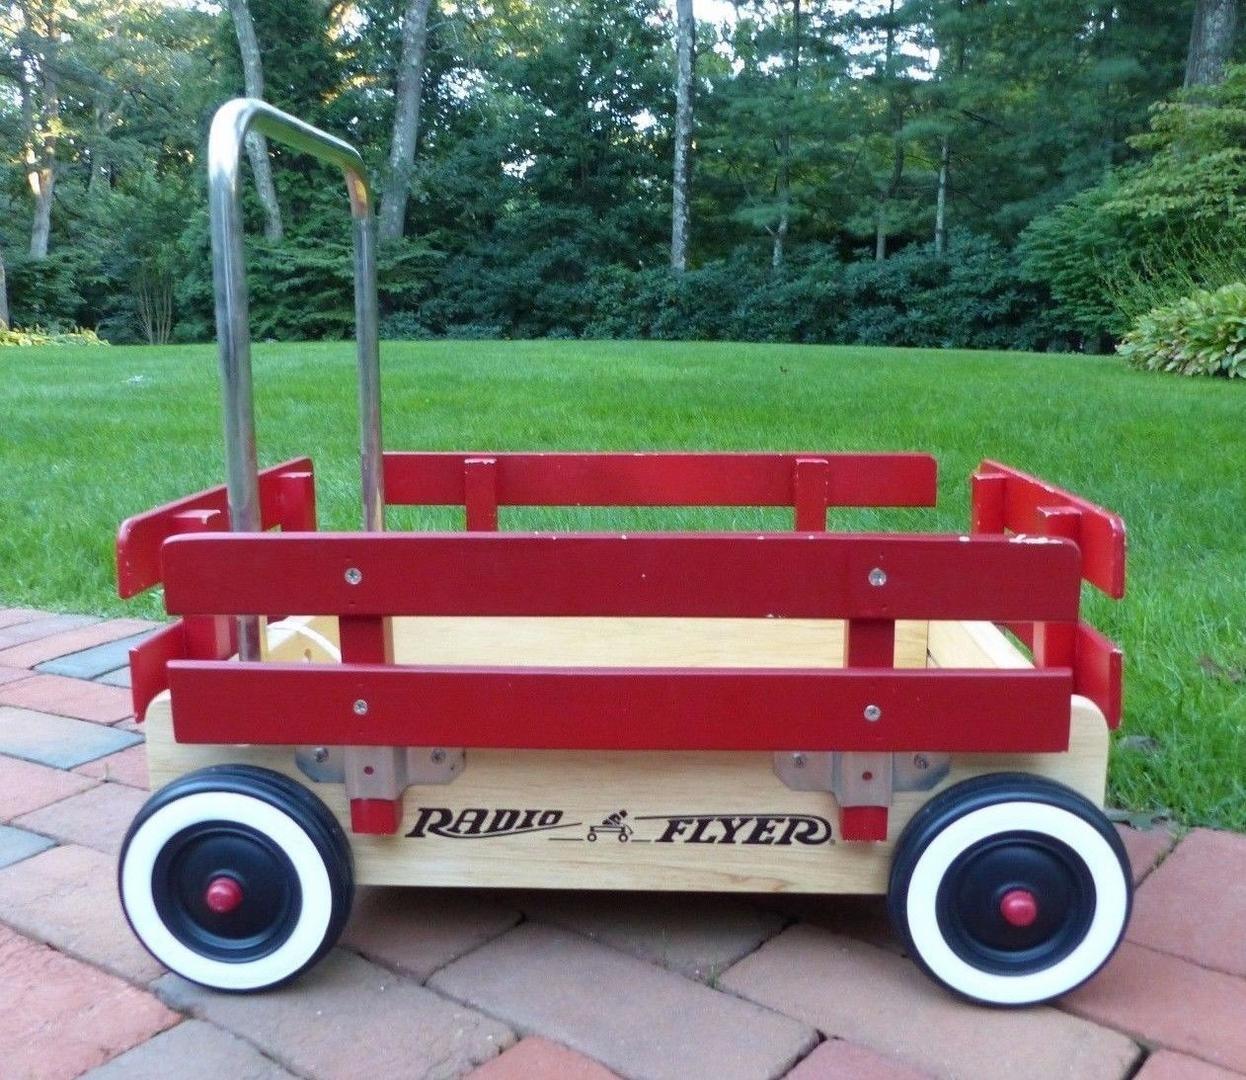 125 2018 Red Radio Flyer Child Wagon Walker Push Wagon Wooden Toy Cart 1953280331 Kids Wagon Radio Flyer Wooden Toys